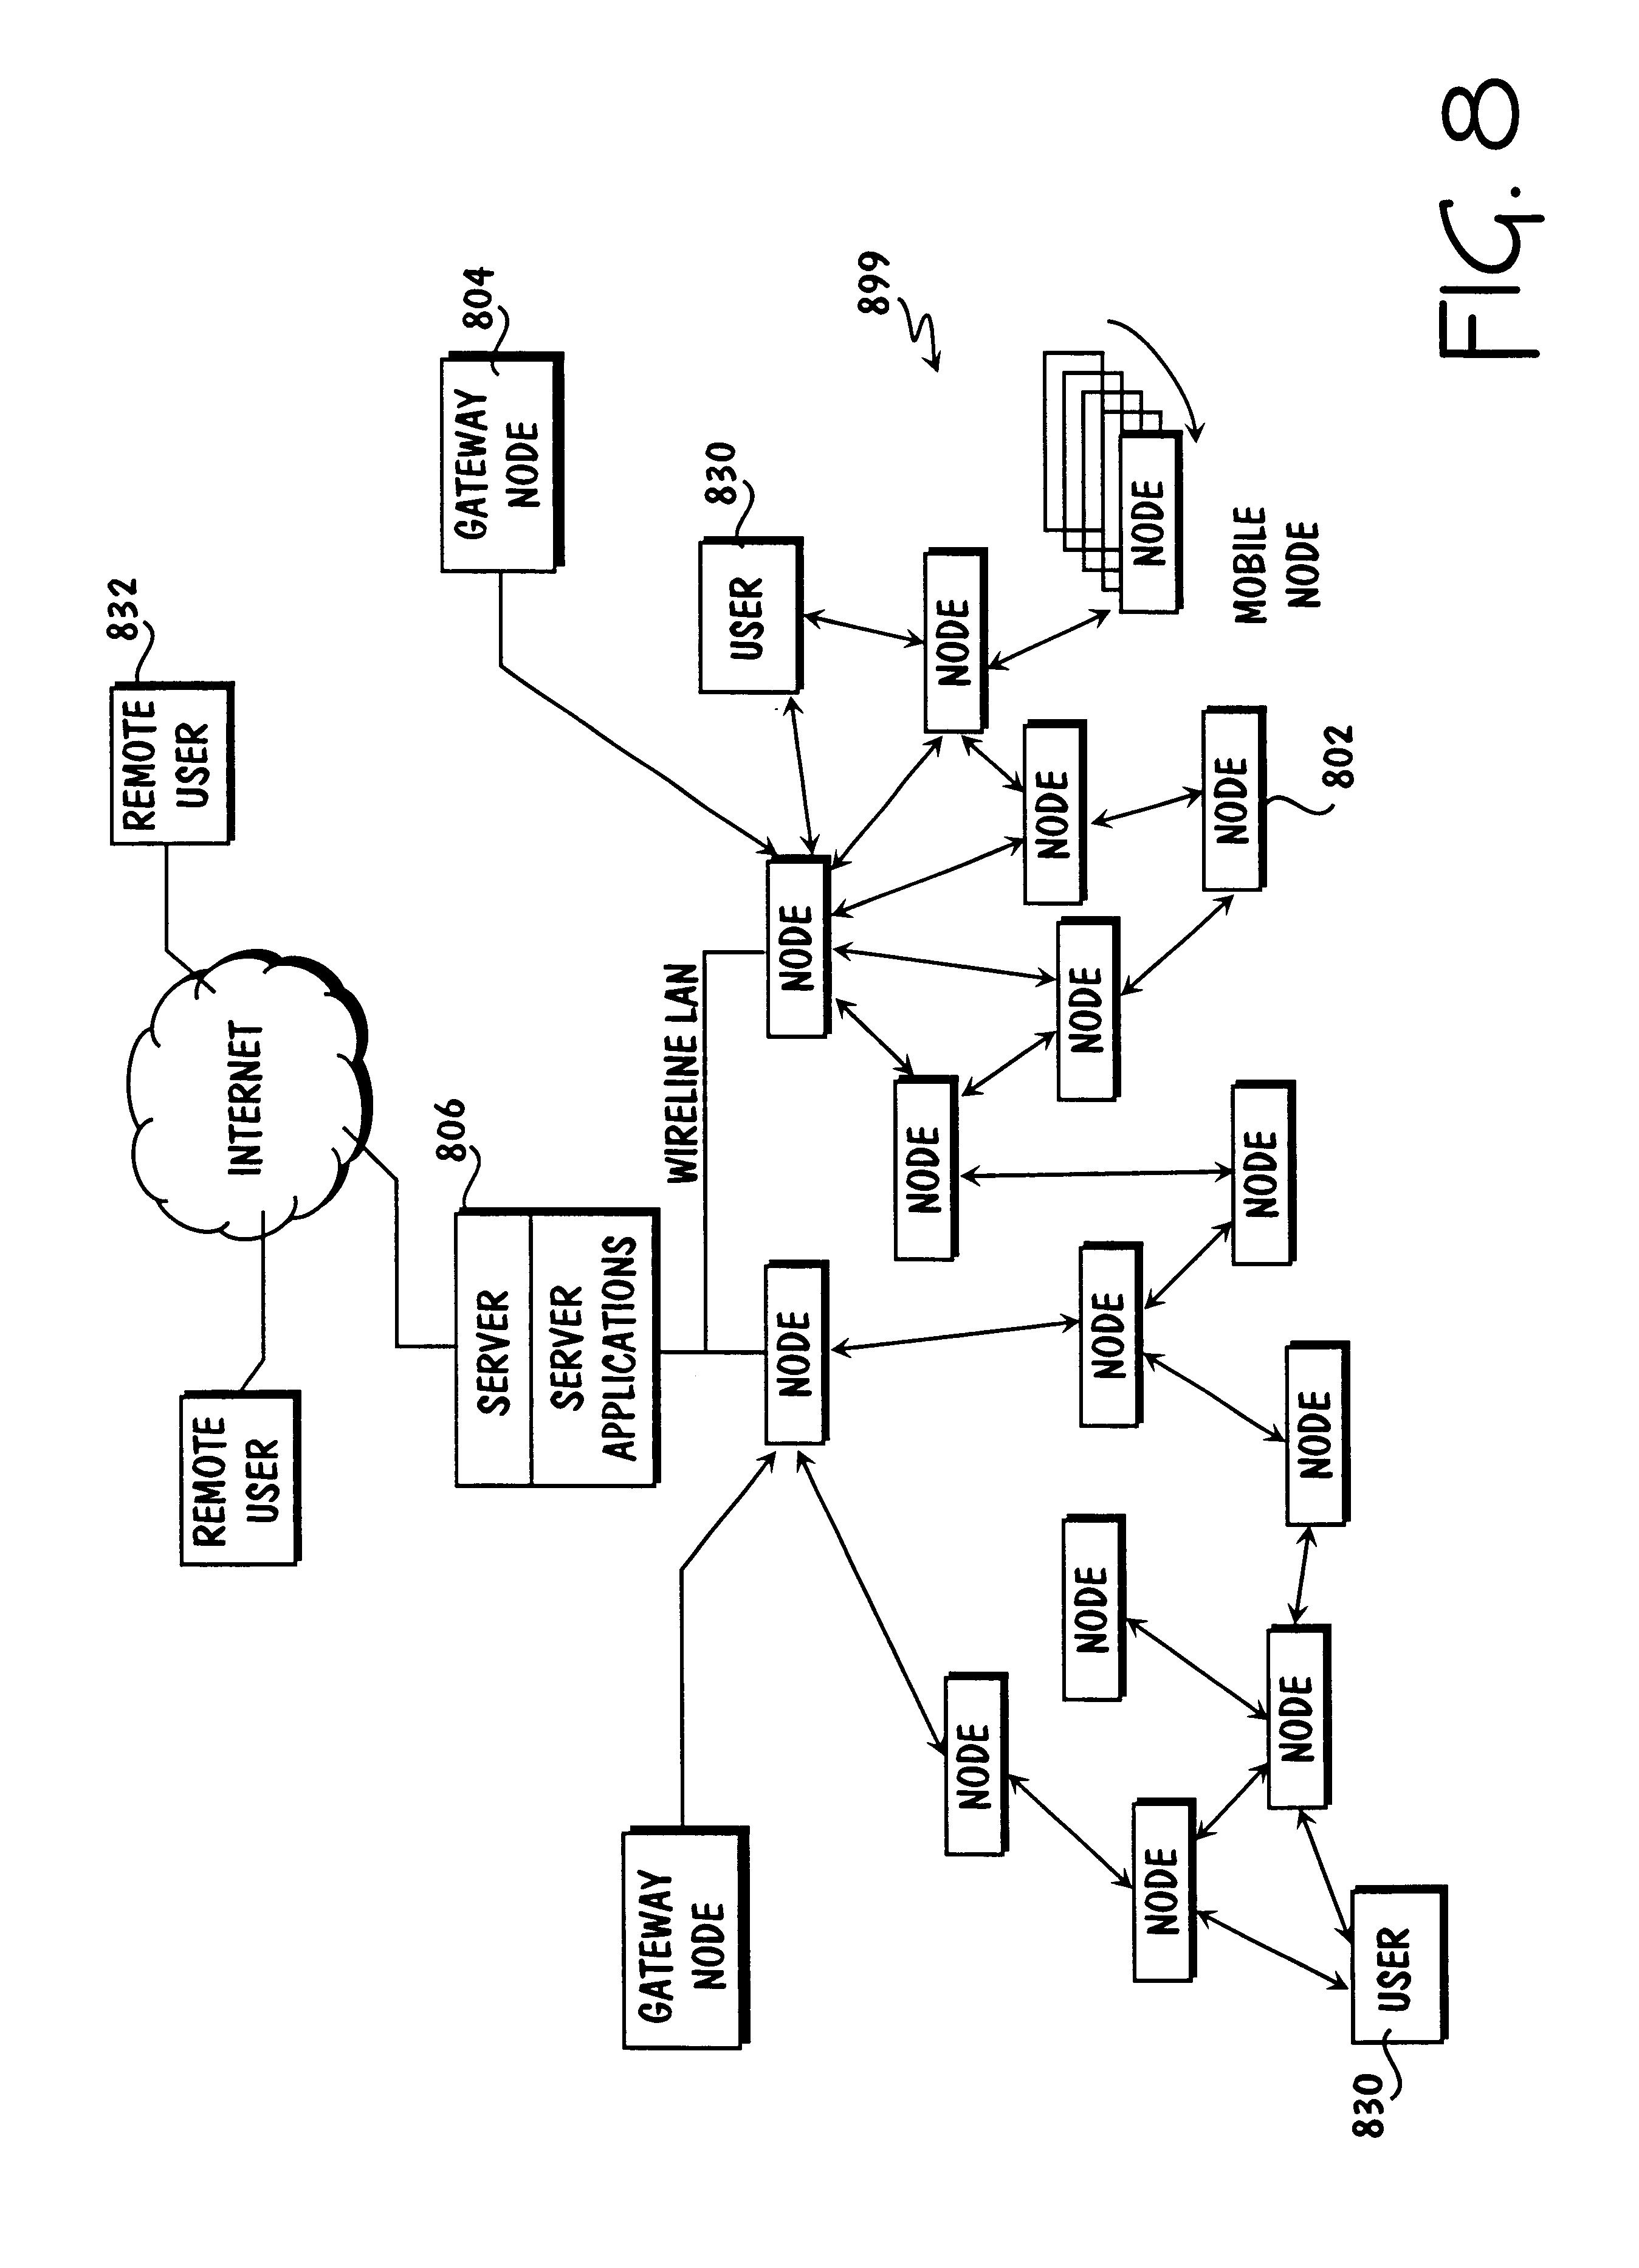 Mobile Phone Jammer Circuit Diagram Likewise Schematic Circuit Diagram